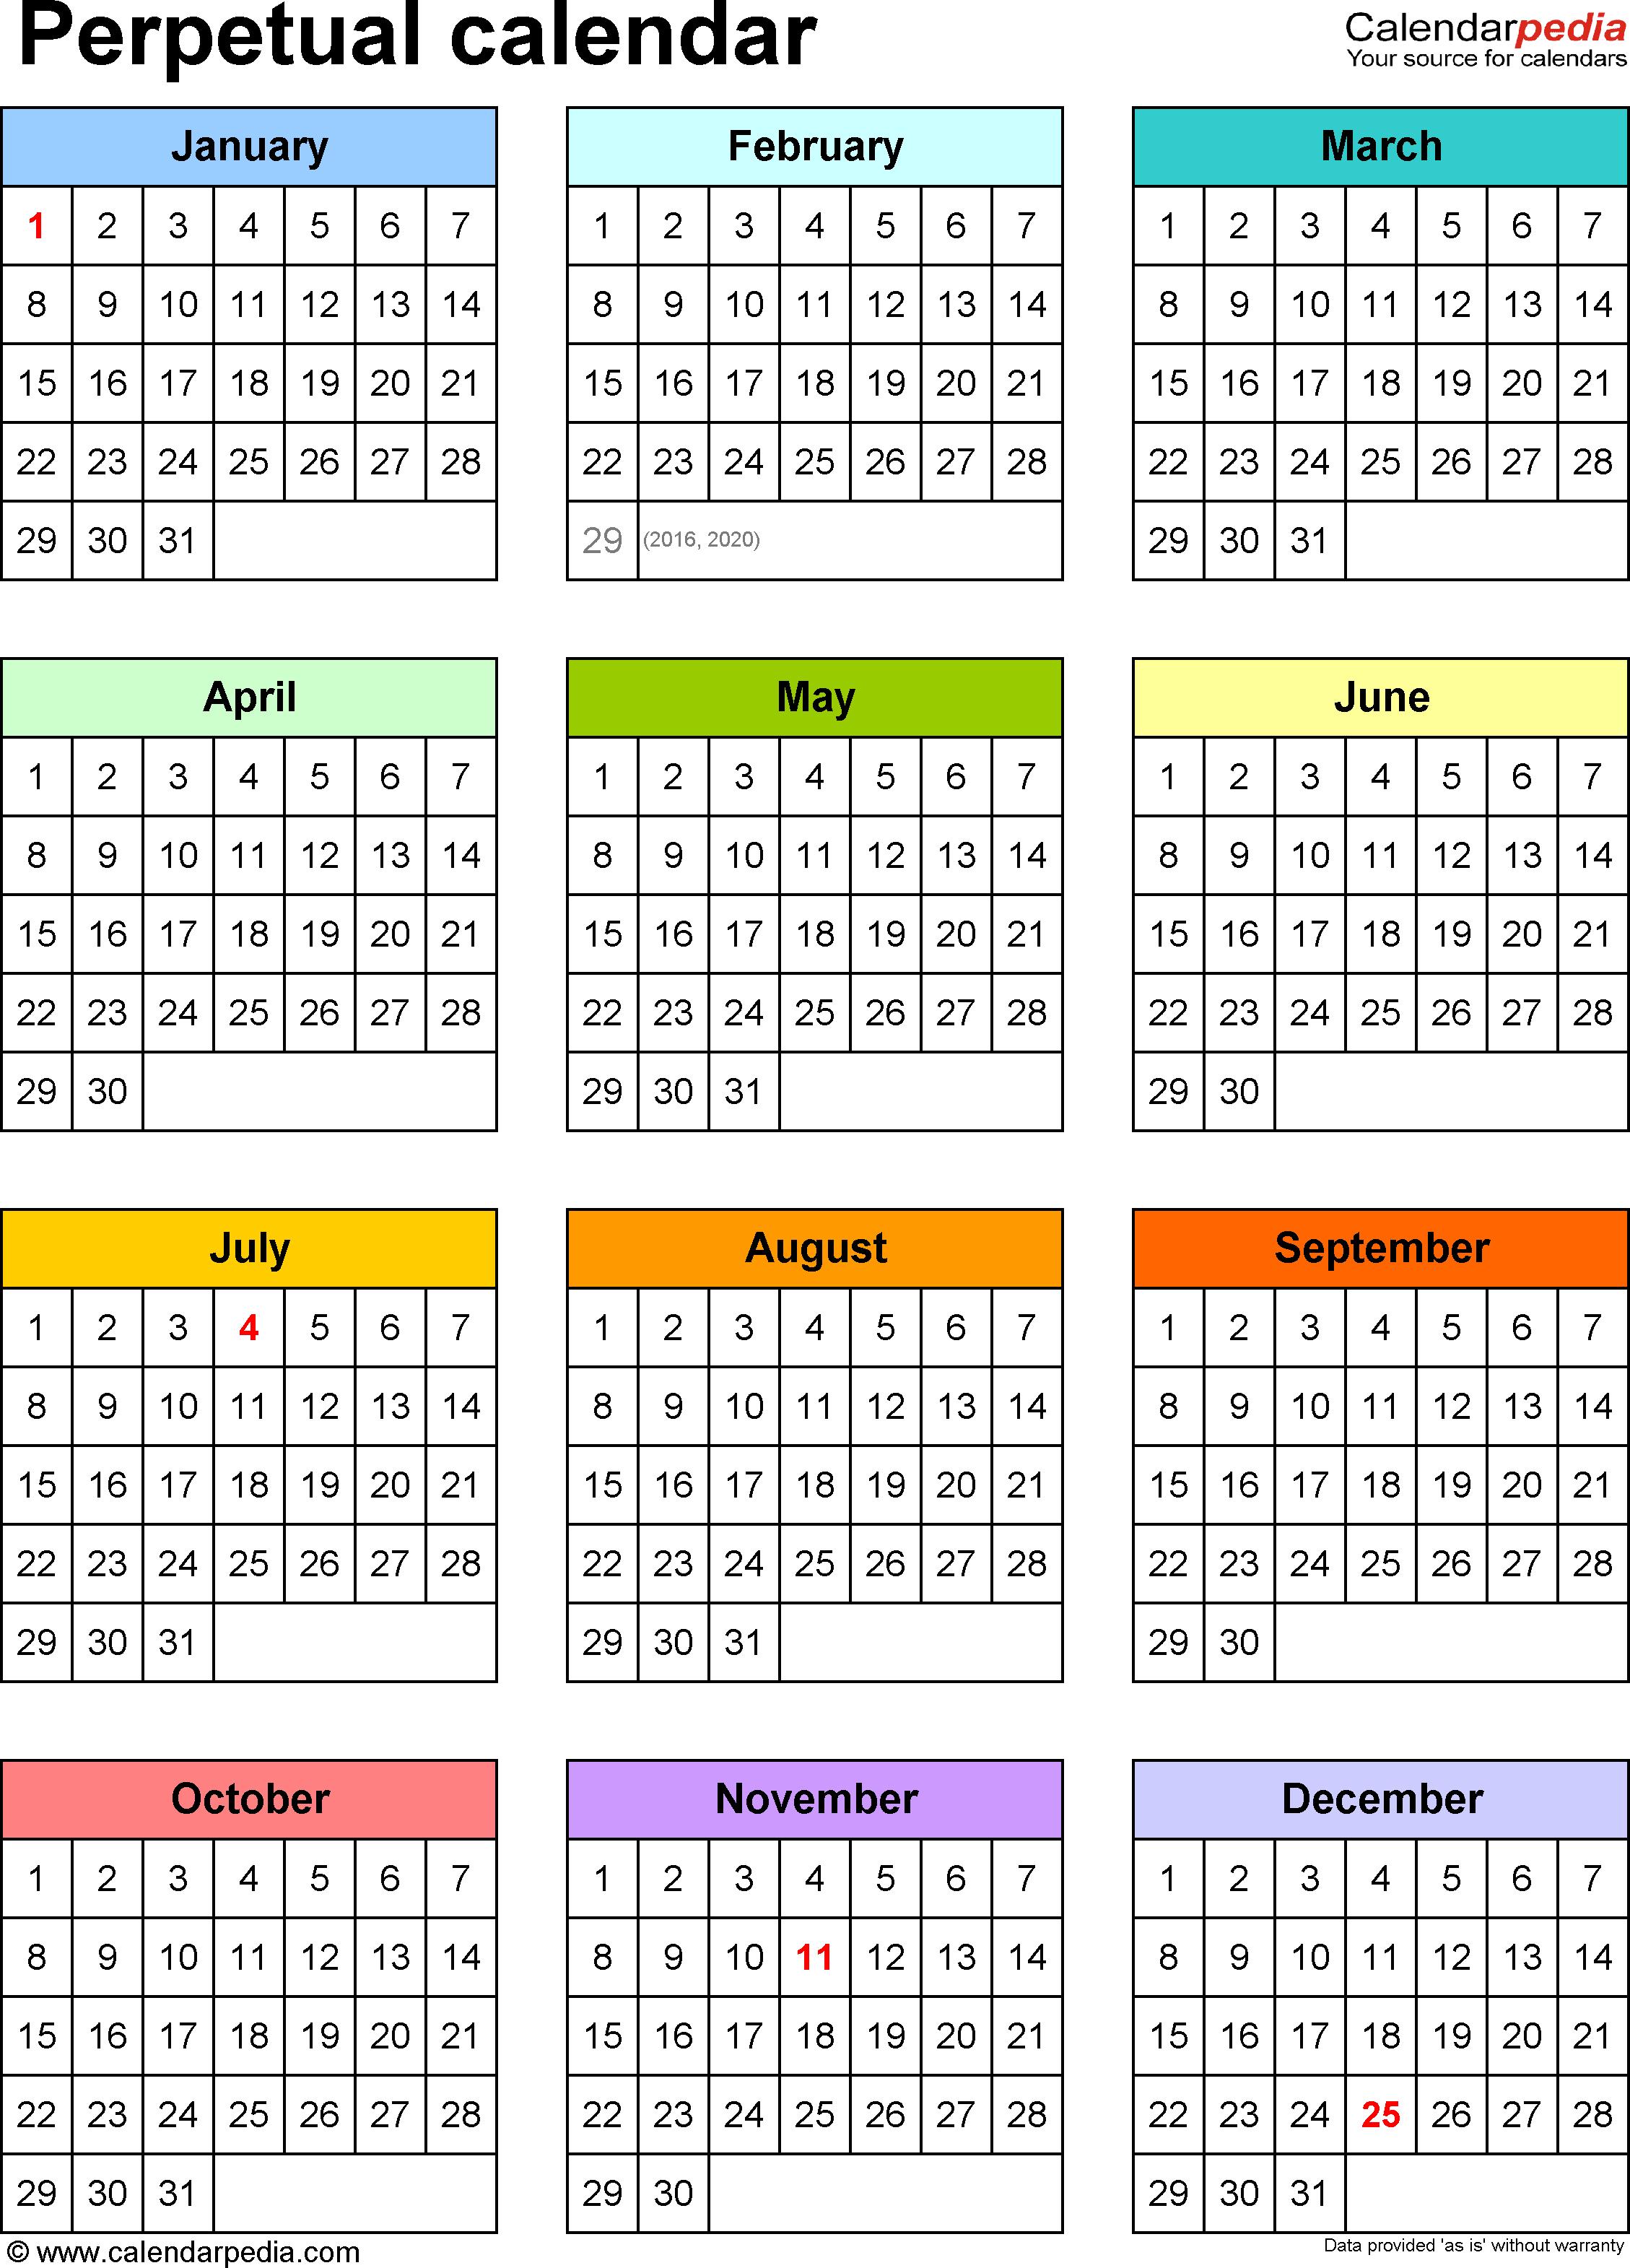 Birthday Calendars Uk | Birthday Calendar App For Windows 7